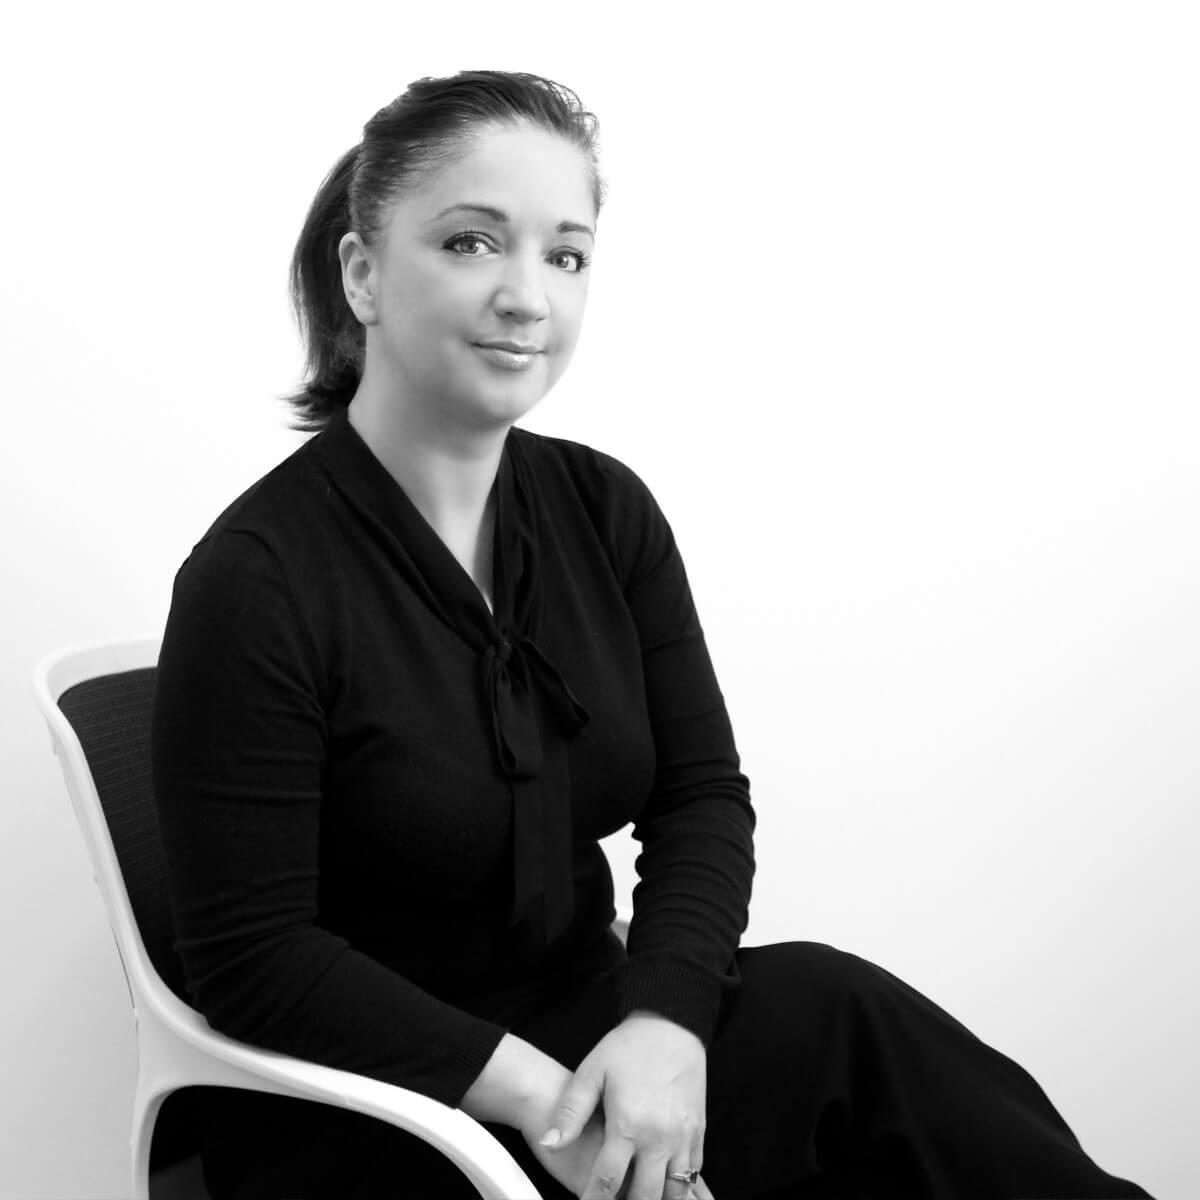 Lenka Pajkosova